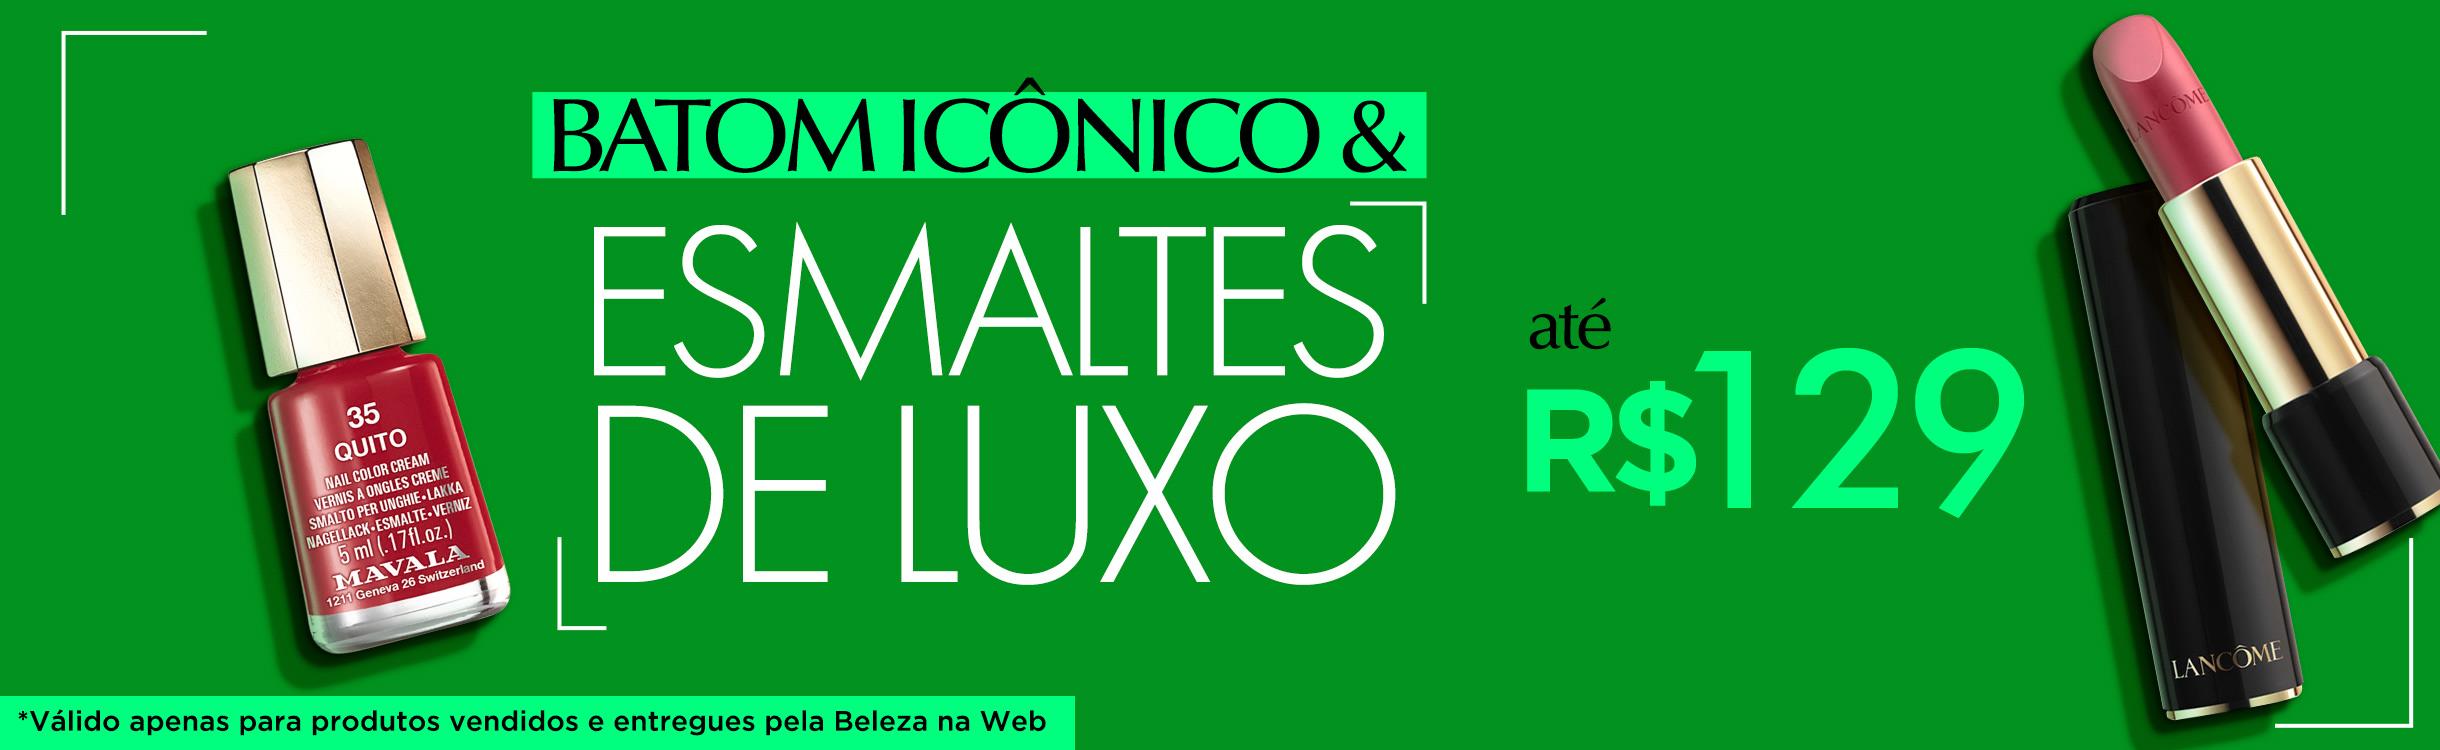 Desejos de Beleza | Batom Icônico e Esmaltes de Luxo até R$129